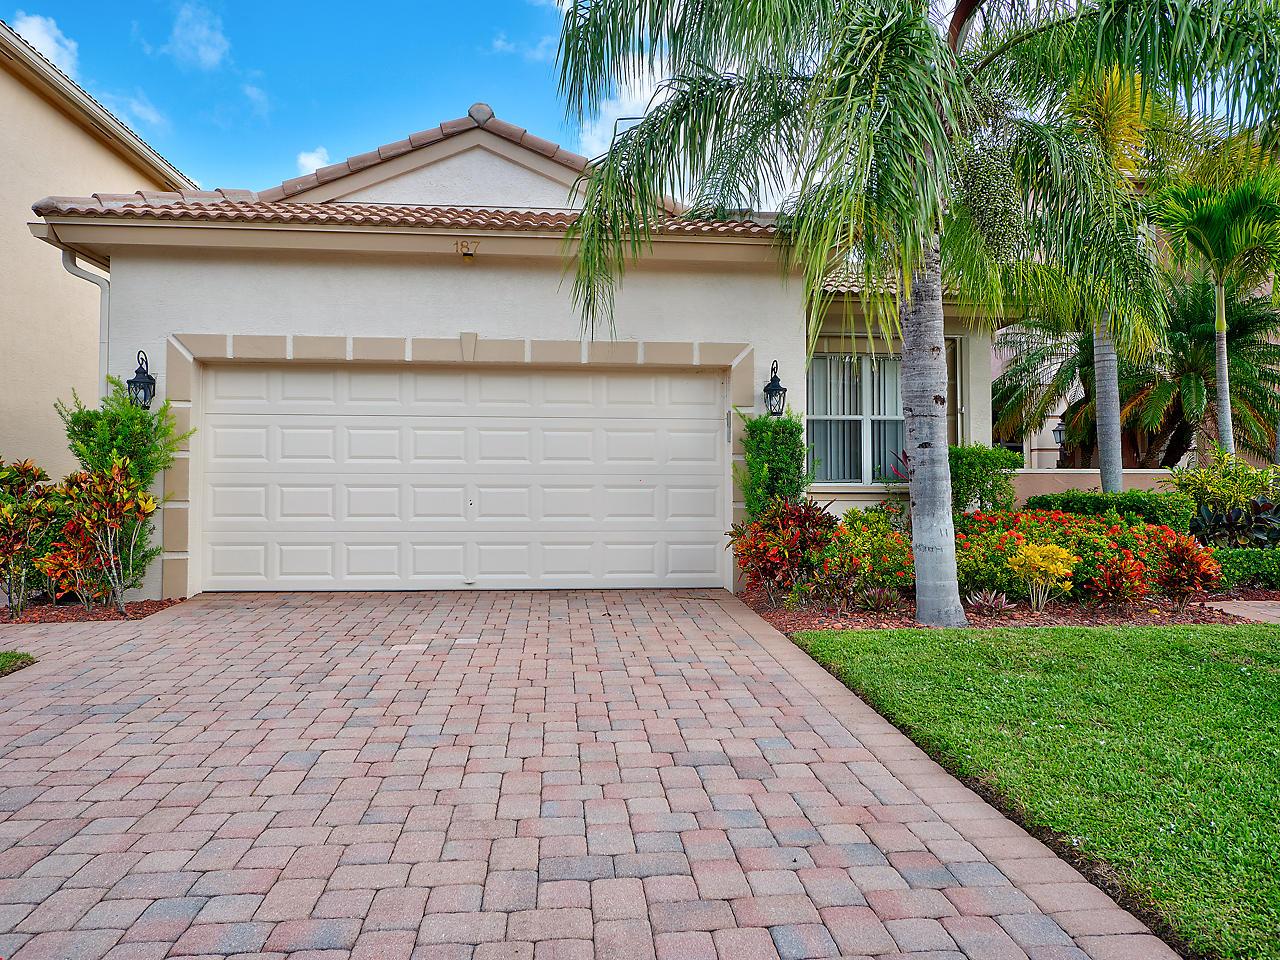 187 Isle Verde Way, Palm Beach Gardens, Florida 33418, 3 Bedrooms Bedrooms, ,2 BathroomsBathrooms,A,Single family,Isle Verde,RX-10467274